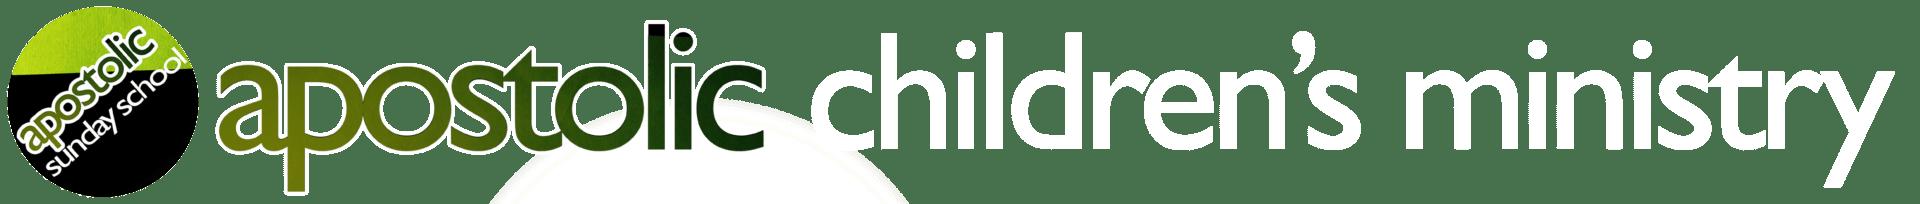 Sunday School Object Lessons – Apostolic Childrens Ministry